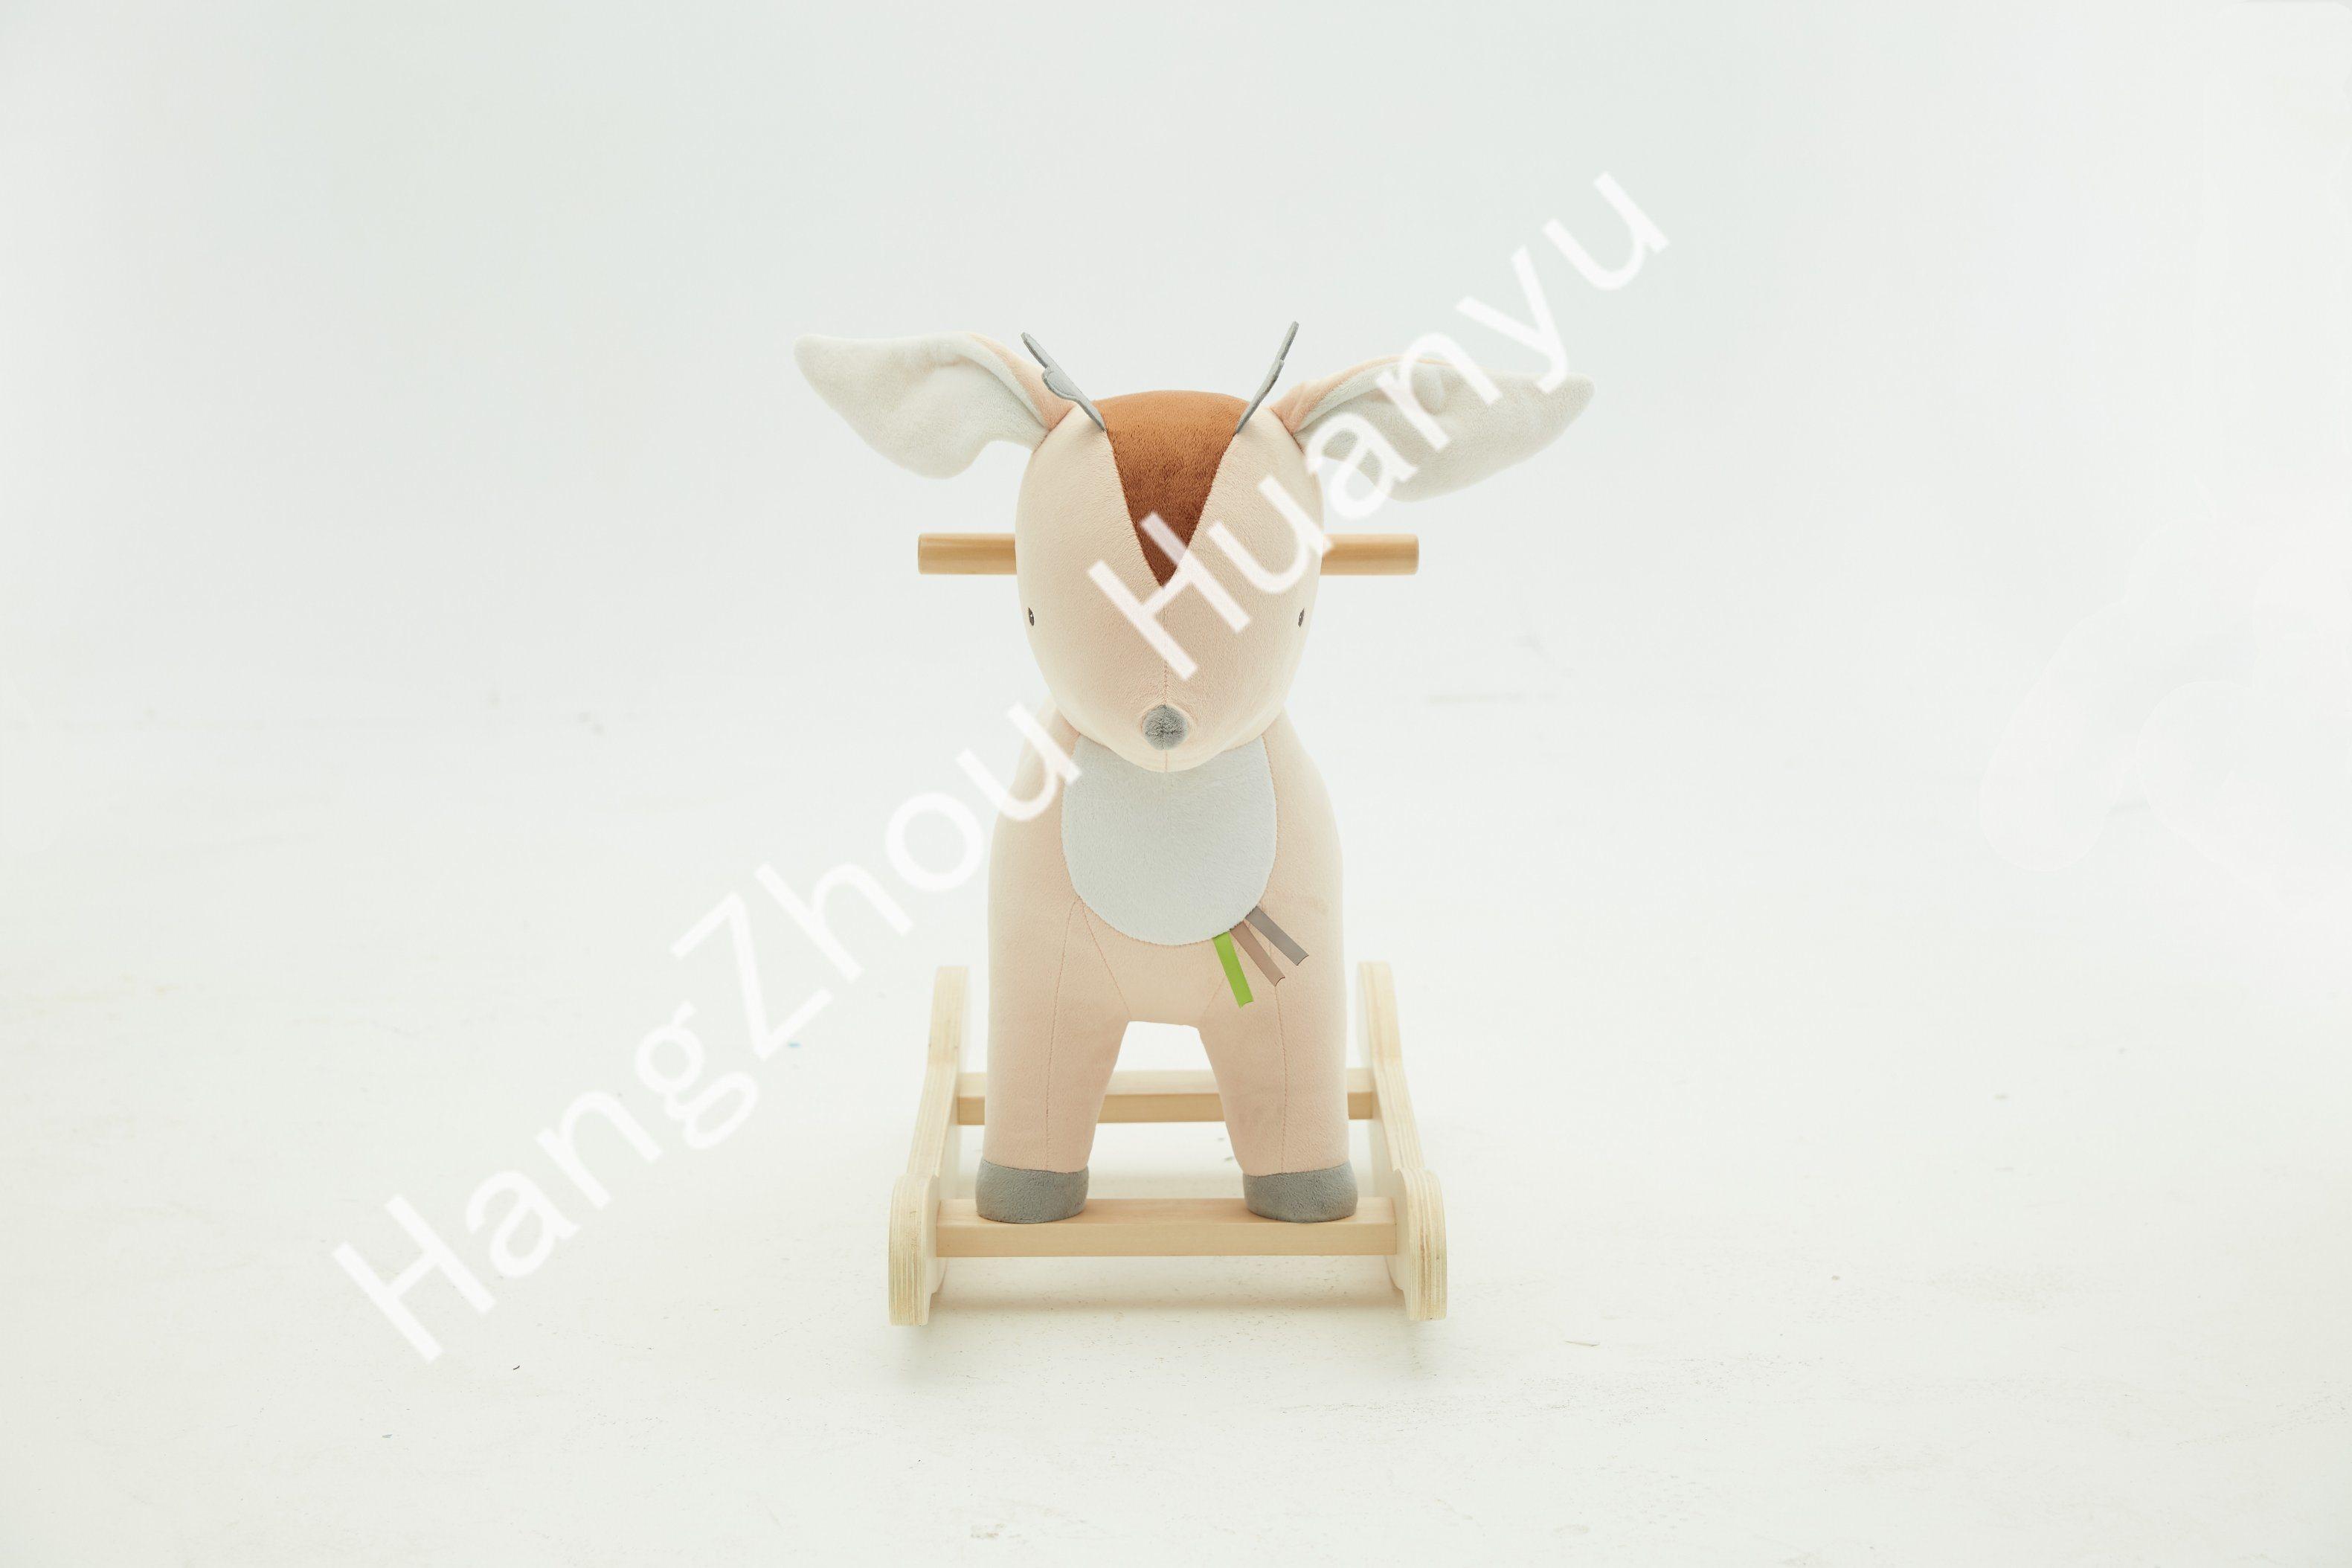 China Labebe Wooden Rocking Horse Animal Deer Ride On Toys China Wooden Toy And Rocking Horse Price